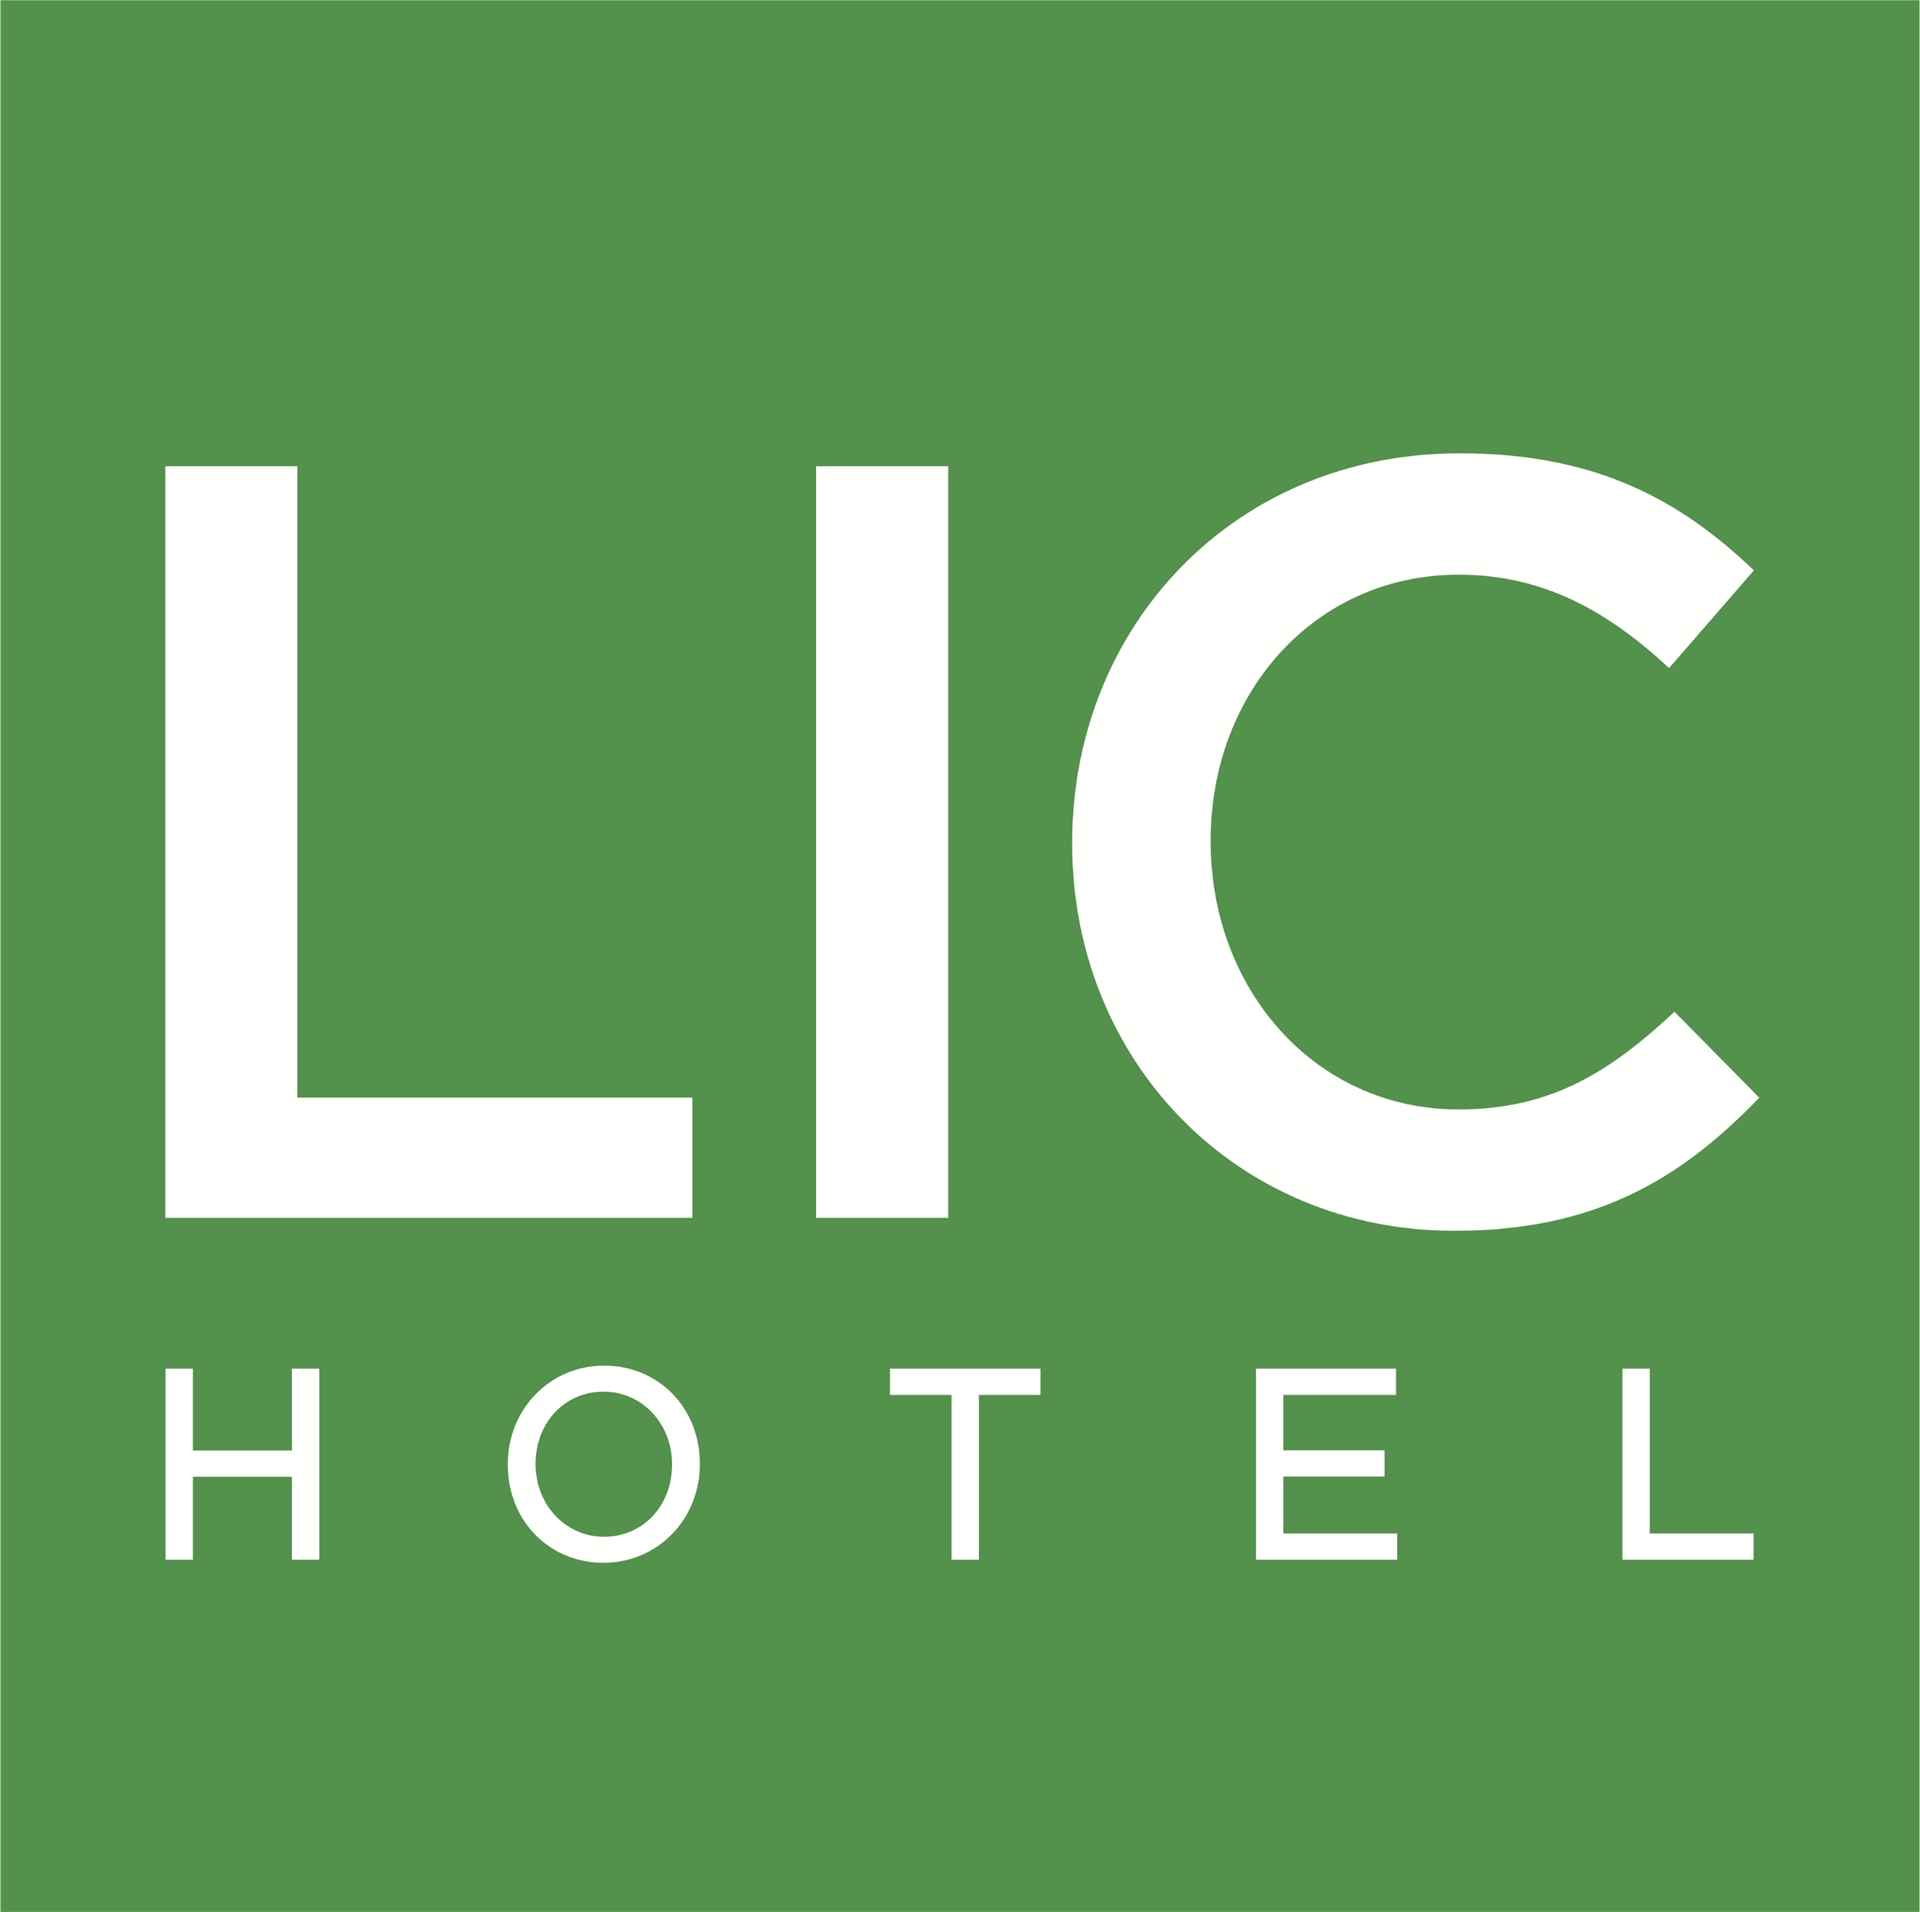 Lic hotel queens united states of america lic hotel lic hotel biocorpaavc Images